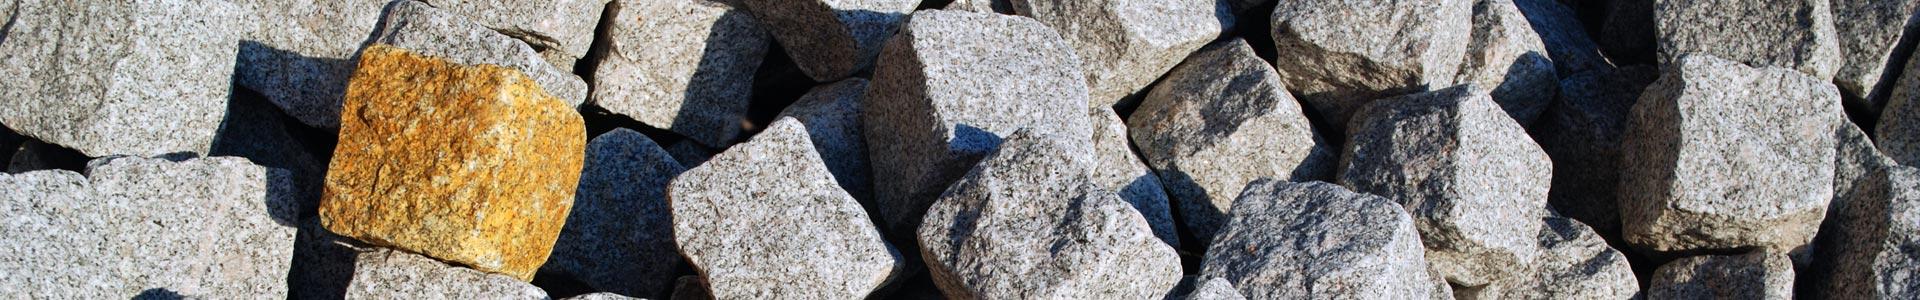 Oporniki granitowe cięte i cięto łupane